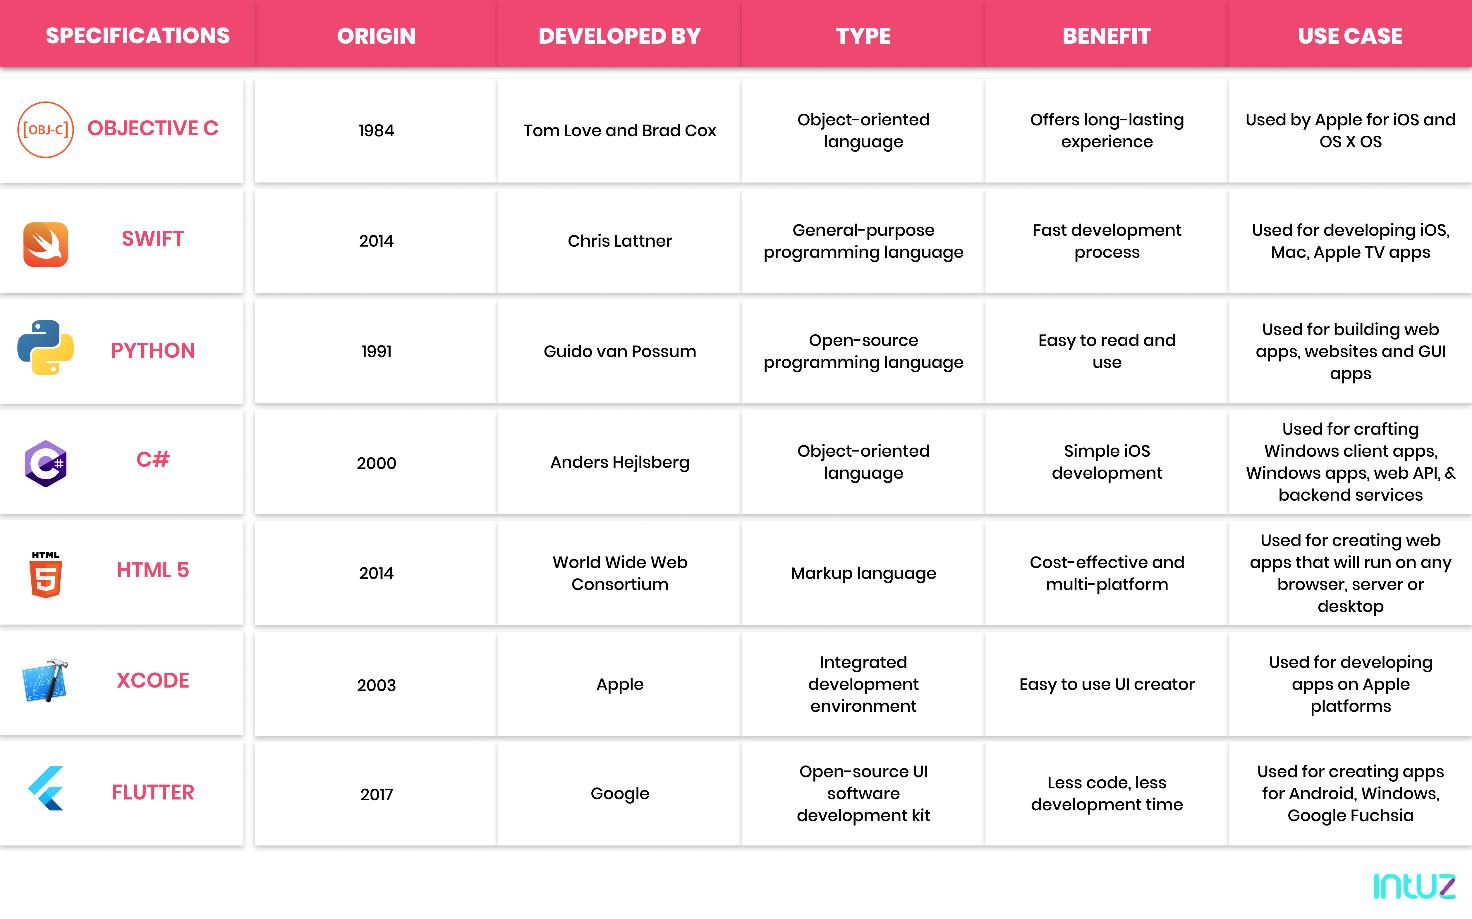 G:\Intuz\Content Plan\Final Content\programming languages for iOS app development\graphics\graphic4 (3).png